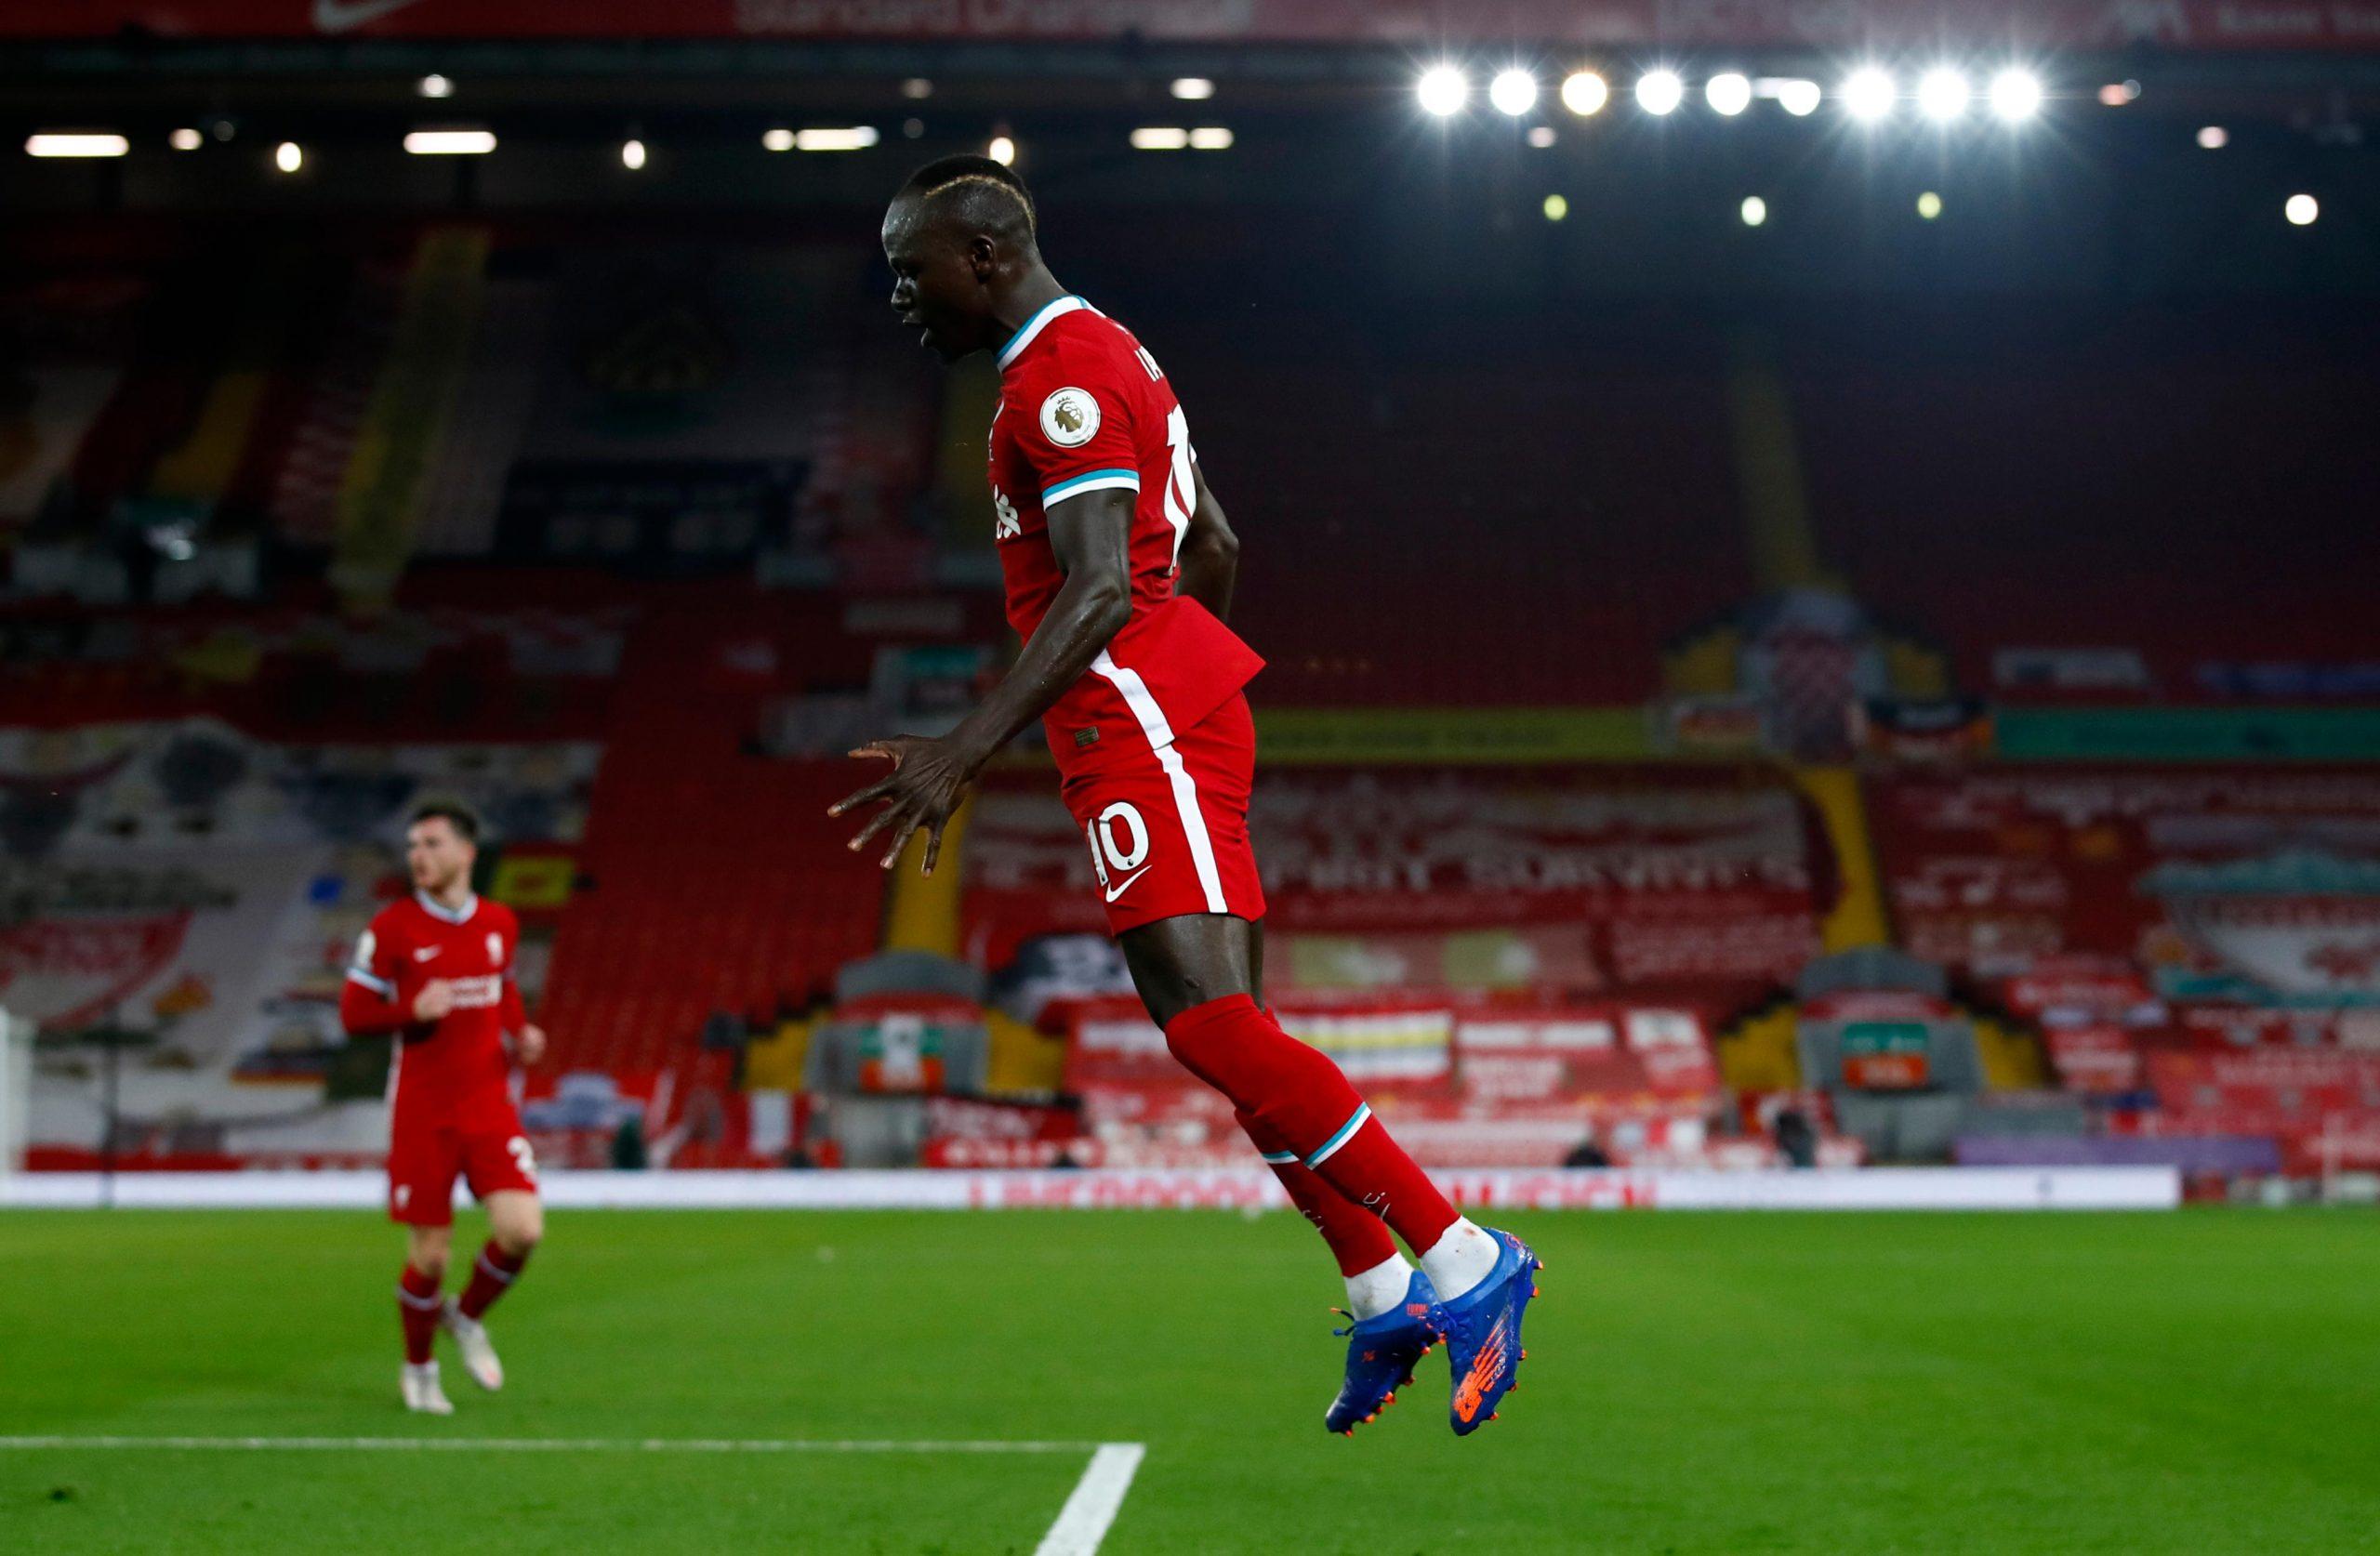 The Liverpool - Arsenal Match